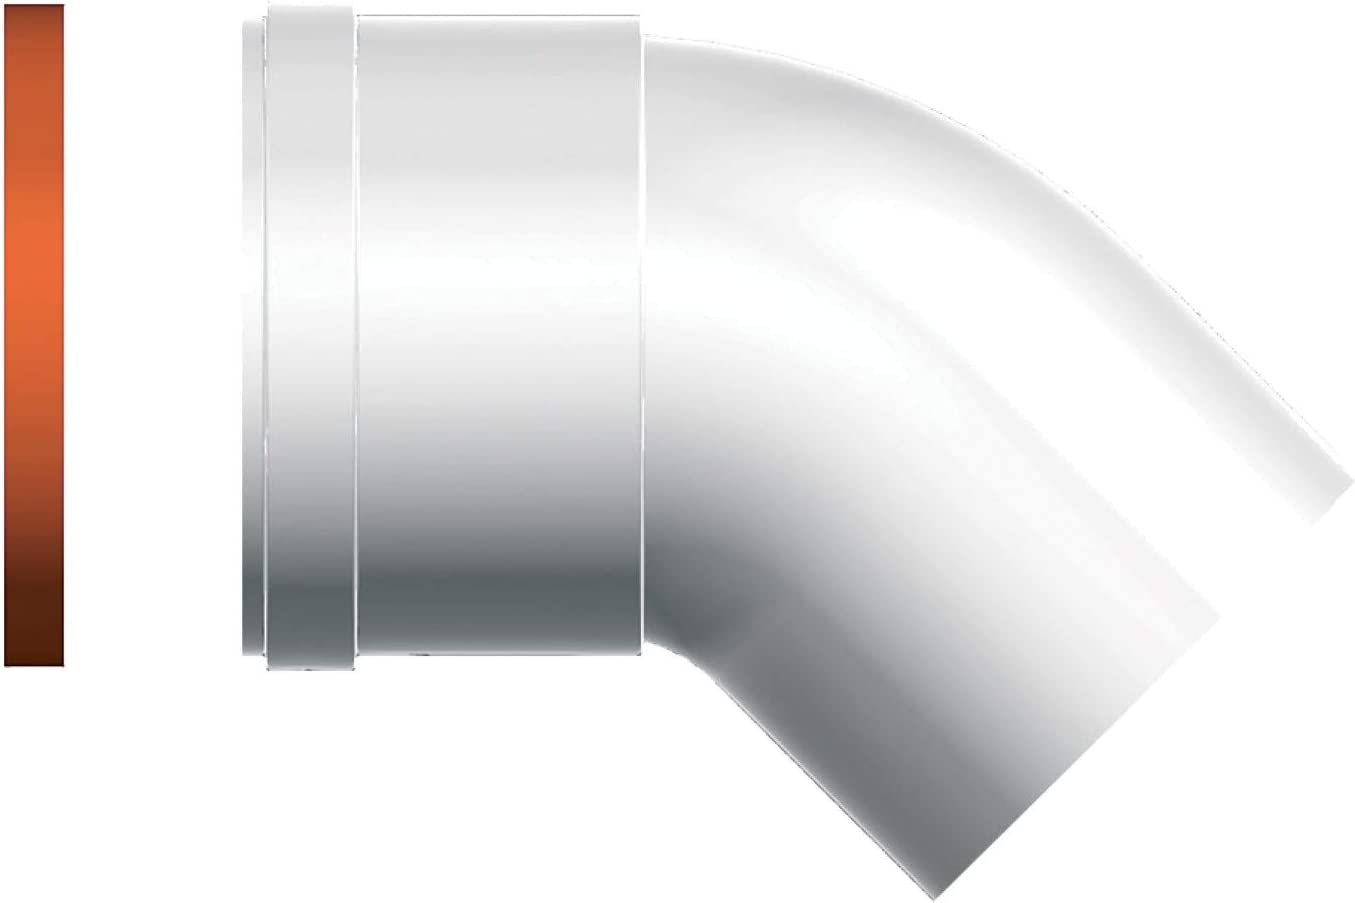 Ariston 3318085 Curva MF Ariston Para Las Calderas de Condensación, Diámetro de 80 a 45°, 2 Unidades